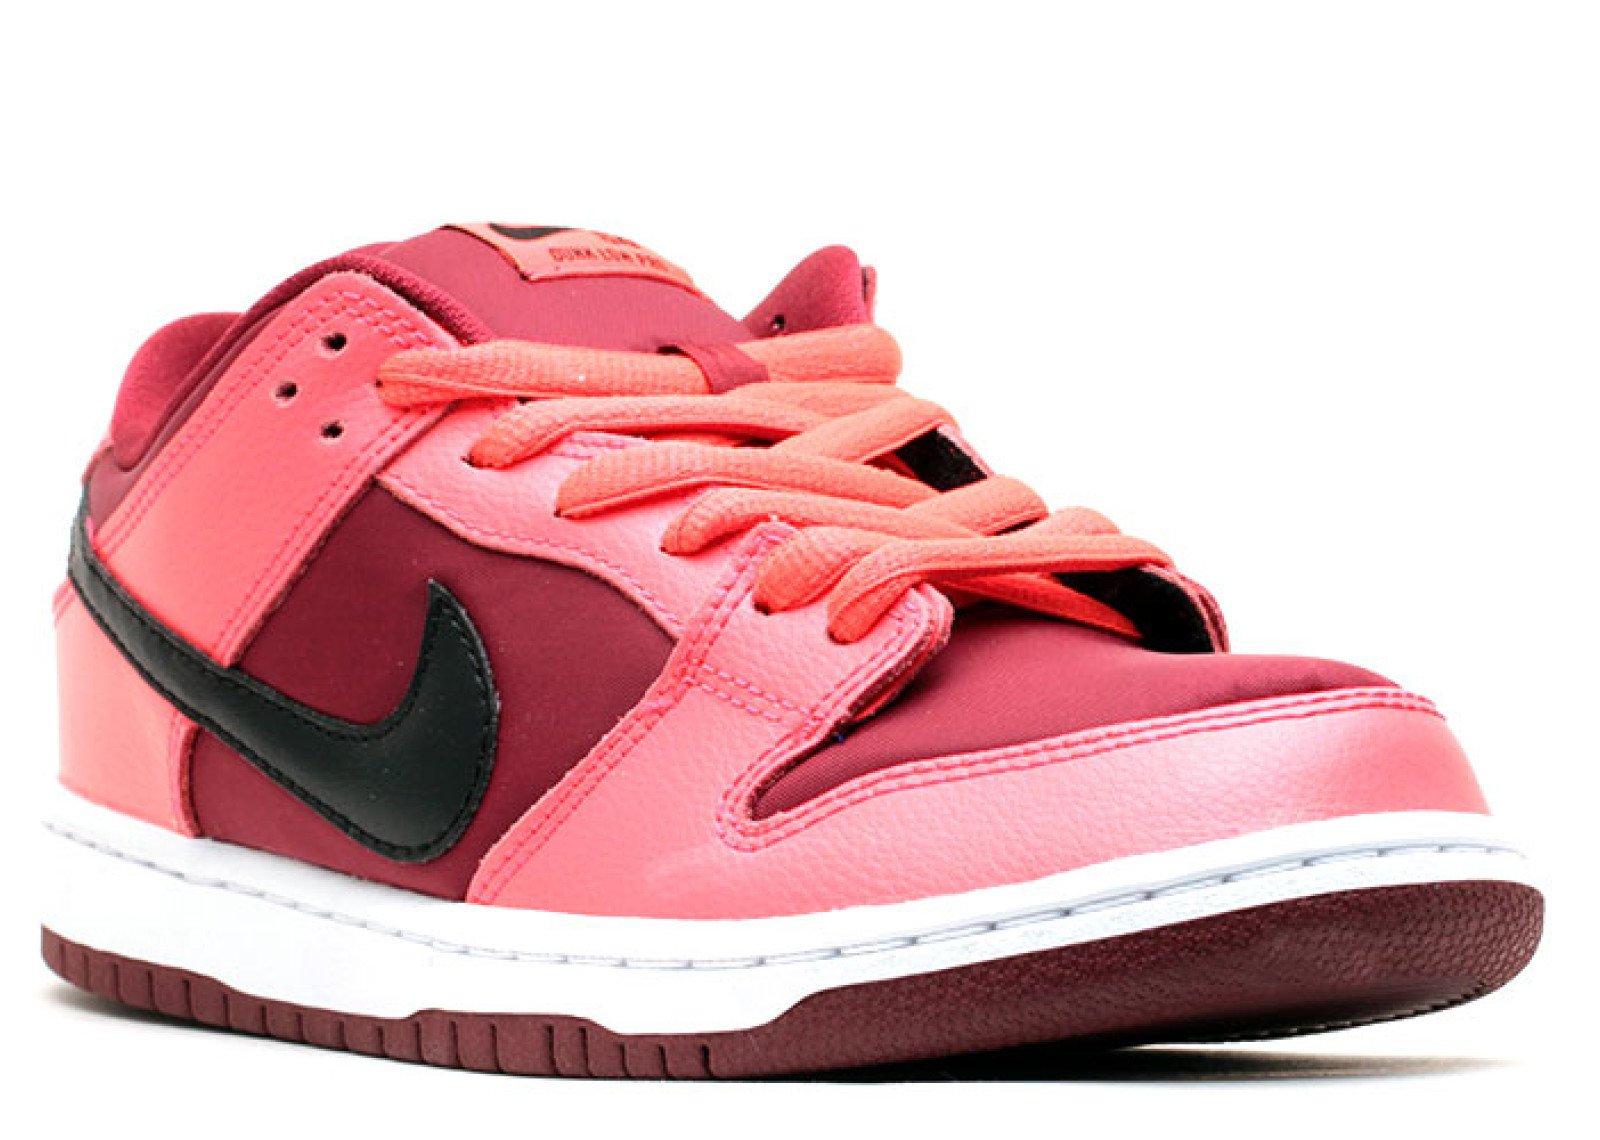 19f925ca2959 Galleon - Nike Mens Dunk Low Pro SB Laser Crimson Black-Team Red Leather  Skateboarding Size 9.5